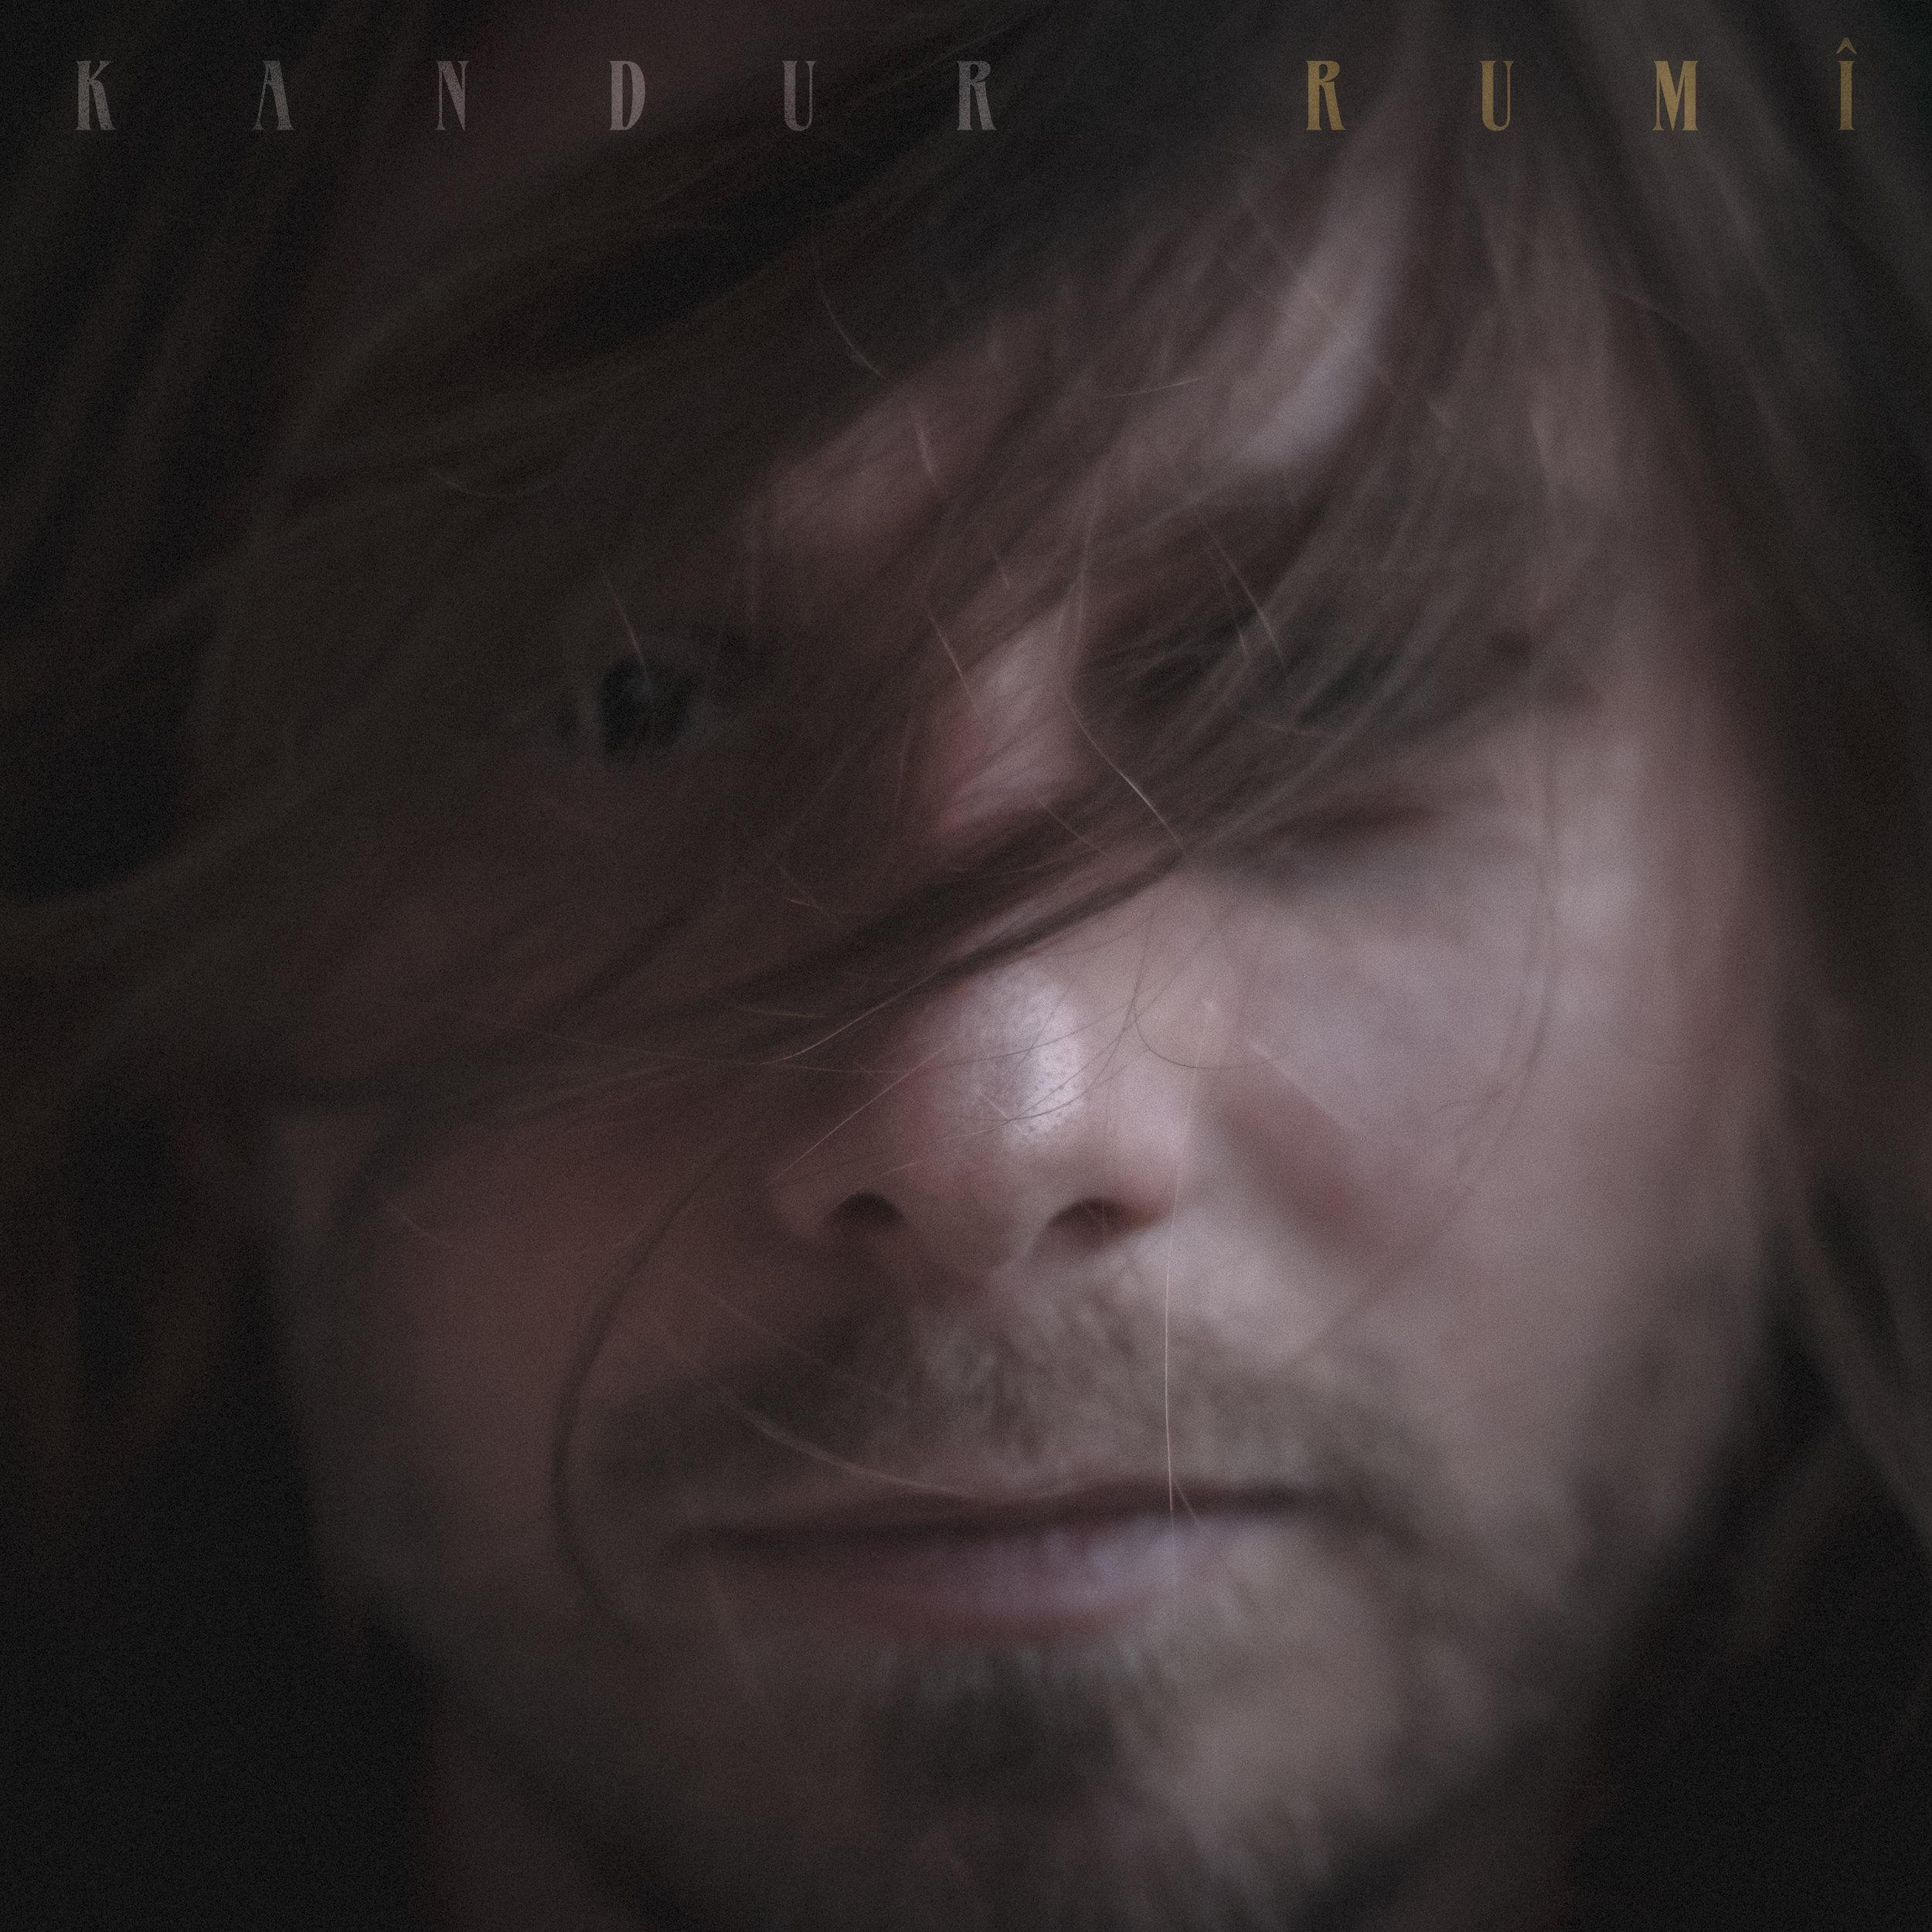 Kandur - Rumi single cover art